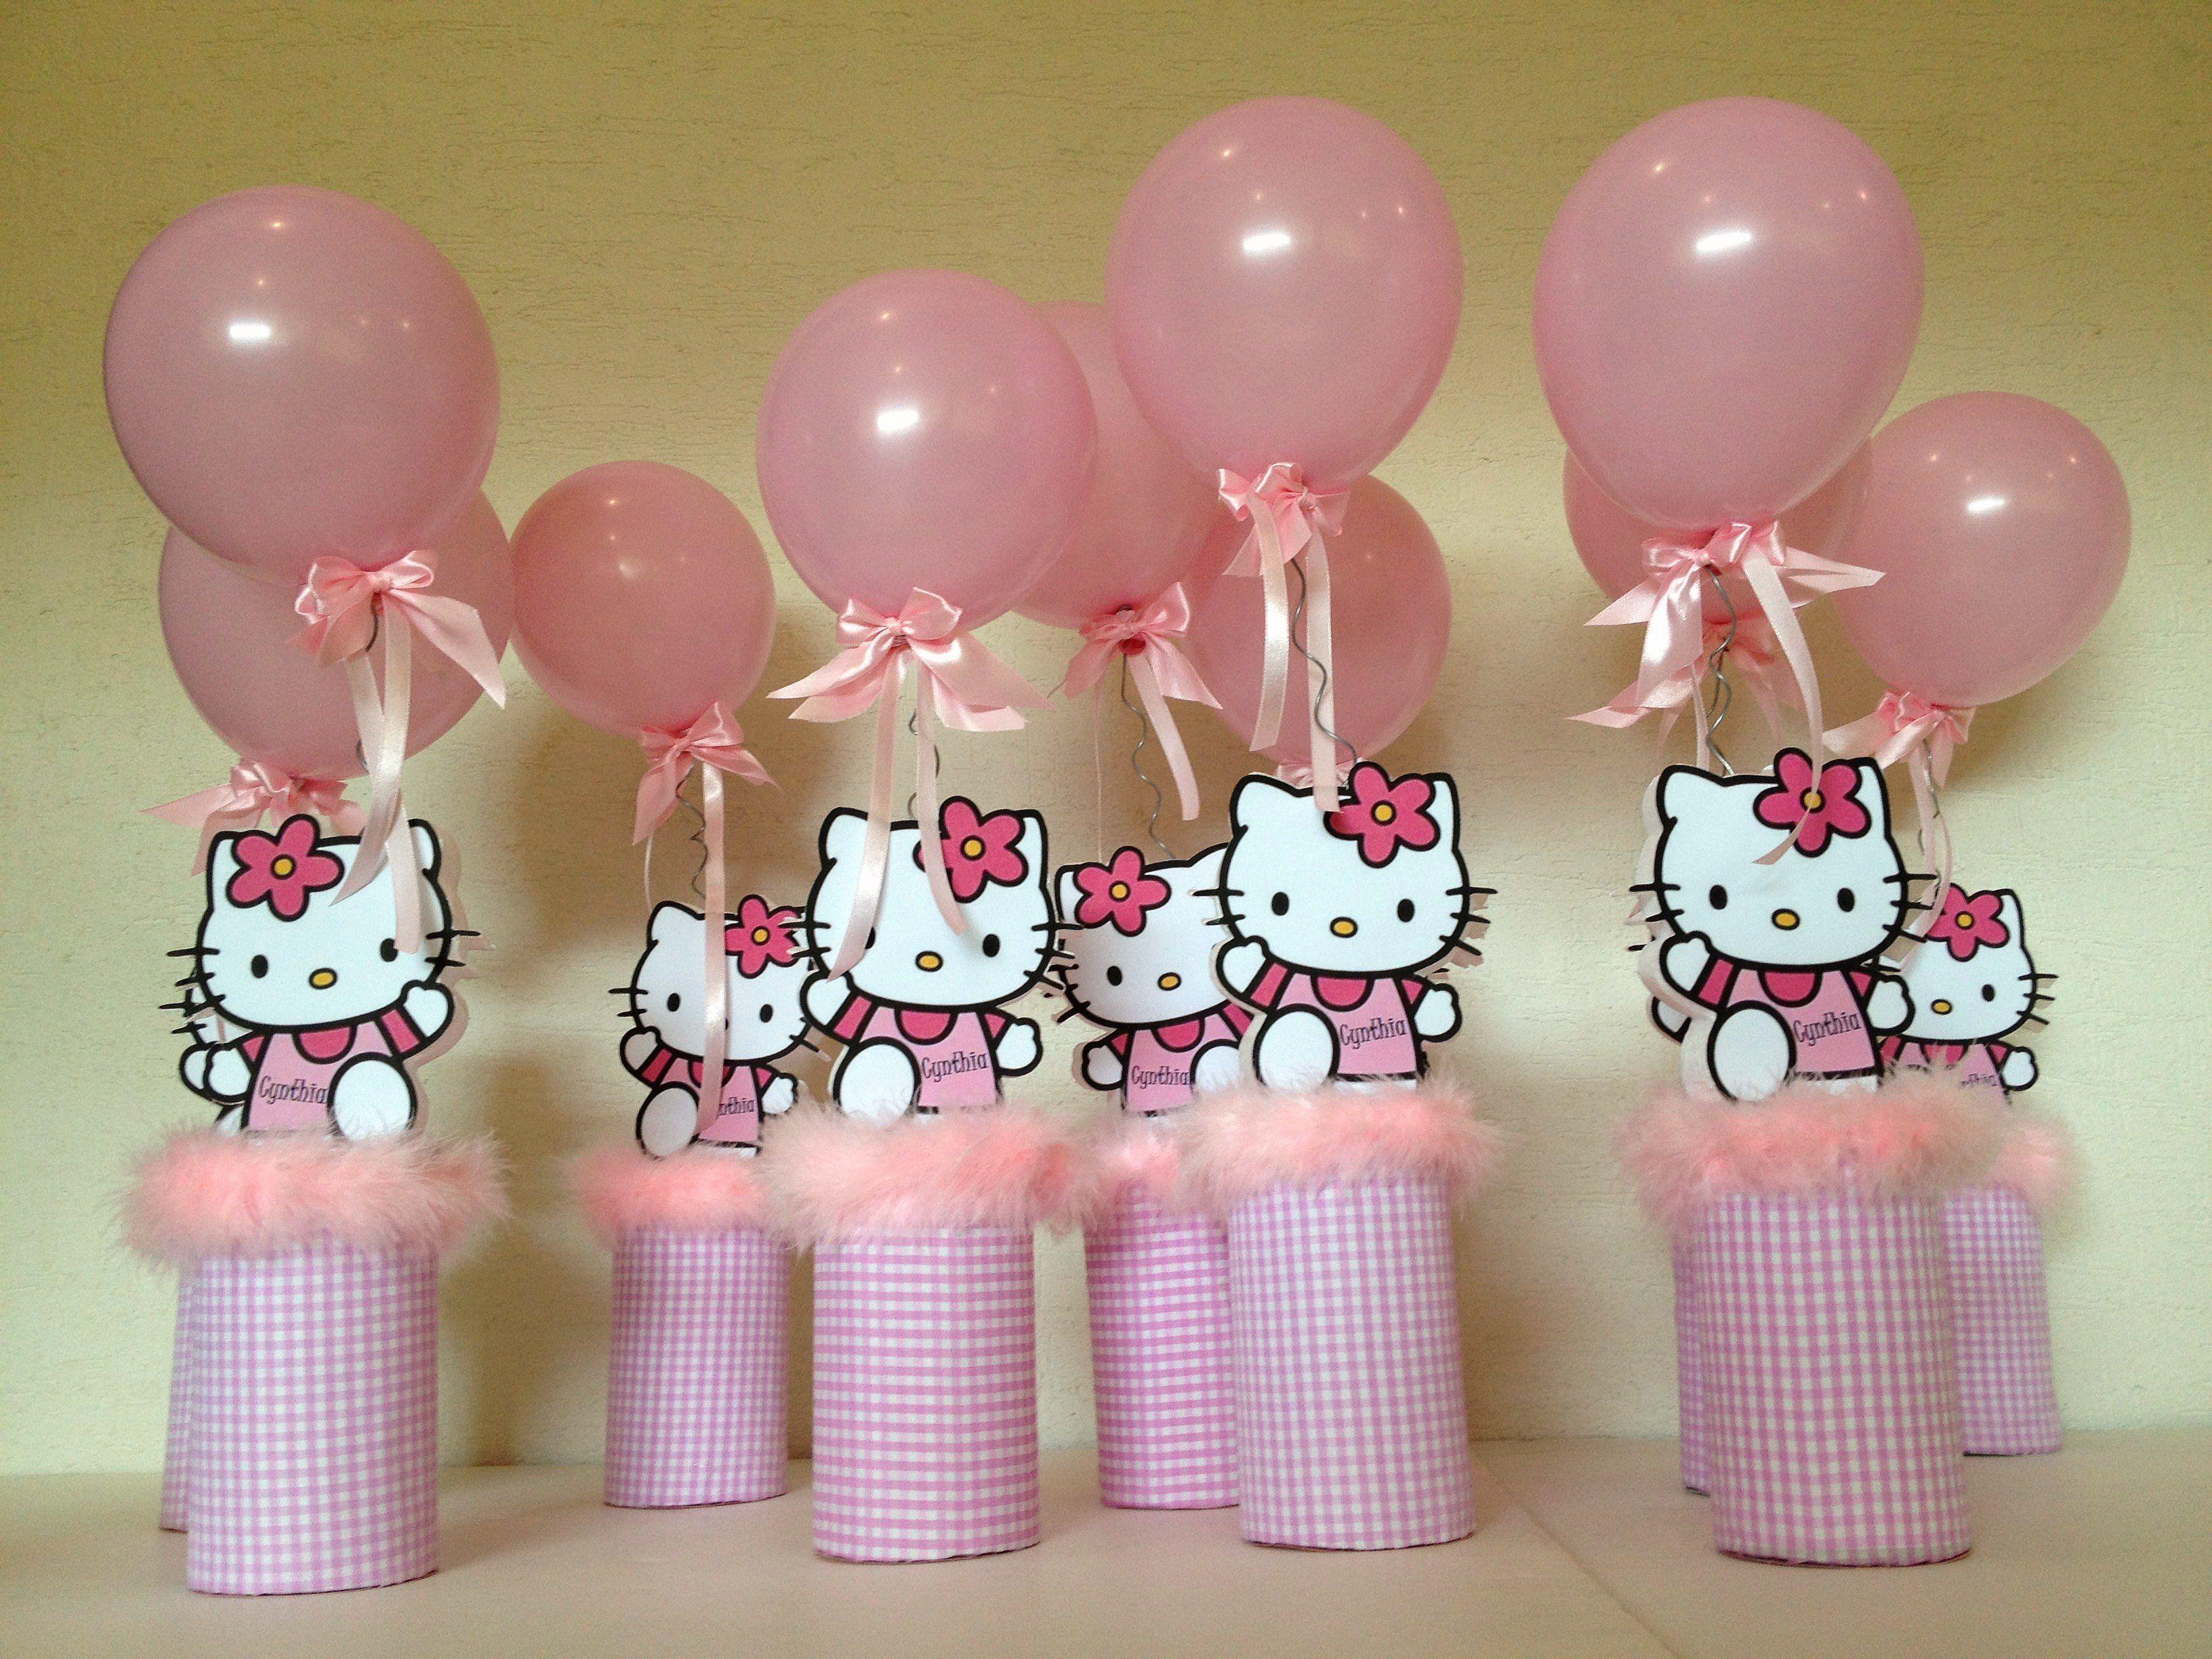 hello kitty baby shower decorations  Cumpleaños Fiesta Infantil